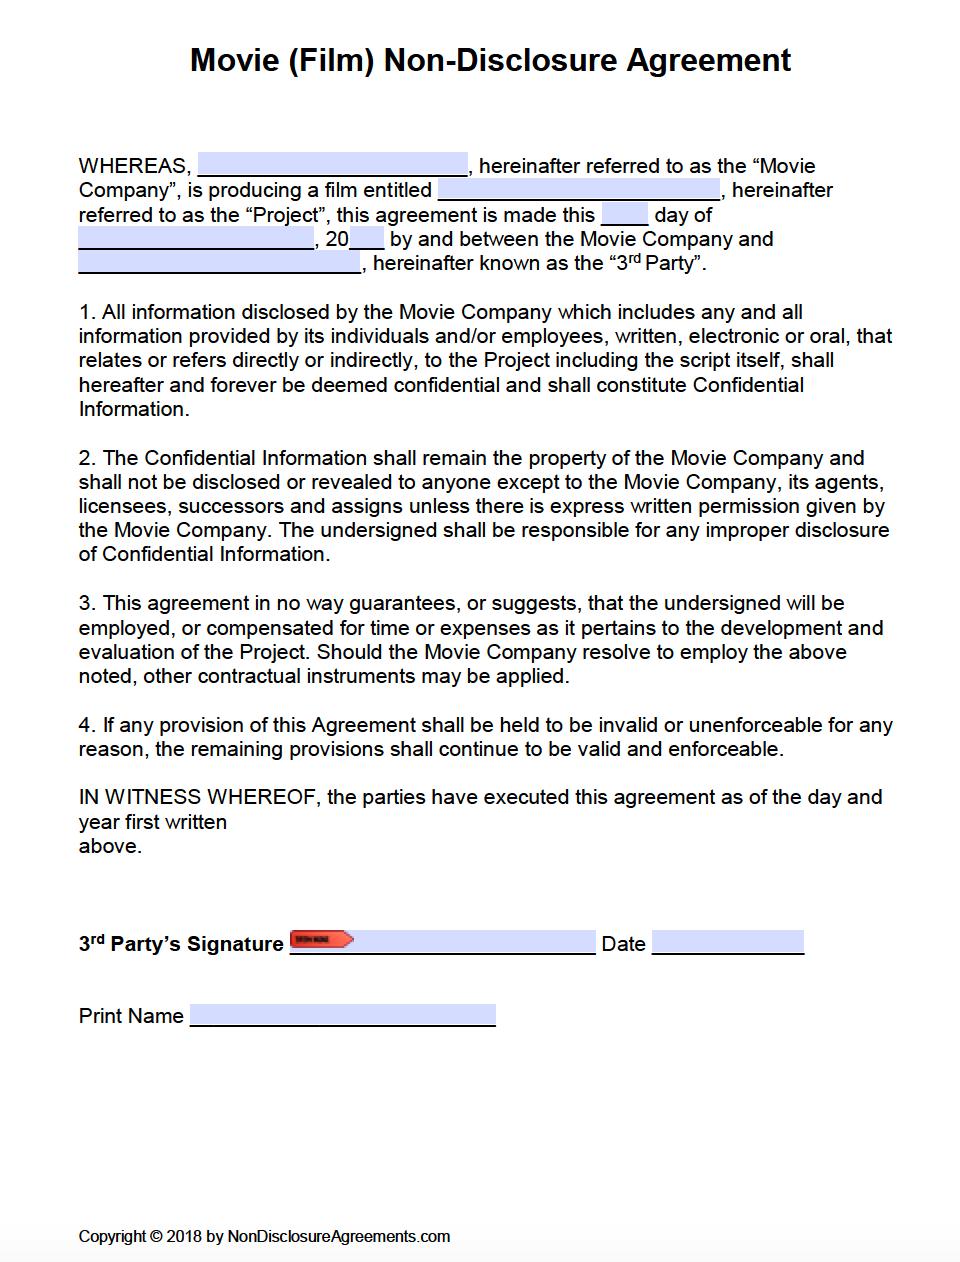 Free Film (Movie) Non-Disclosure Agreement (Nda) Template | Pdf | Word - Free Printable Non Disclosure Agreement Form